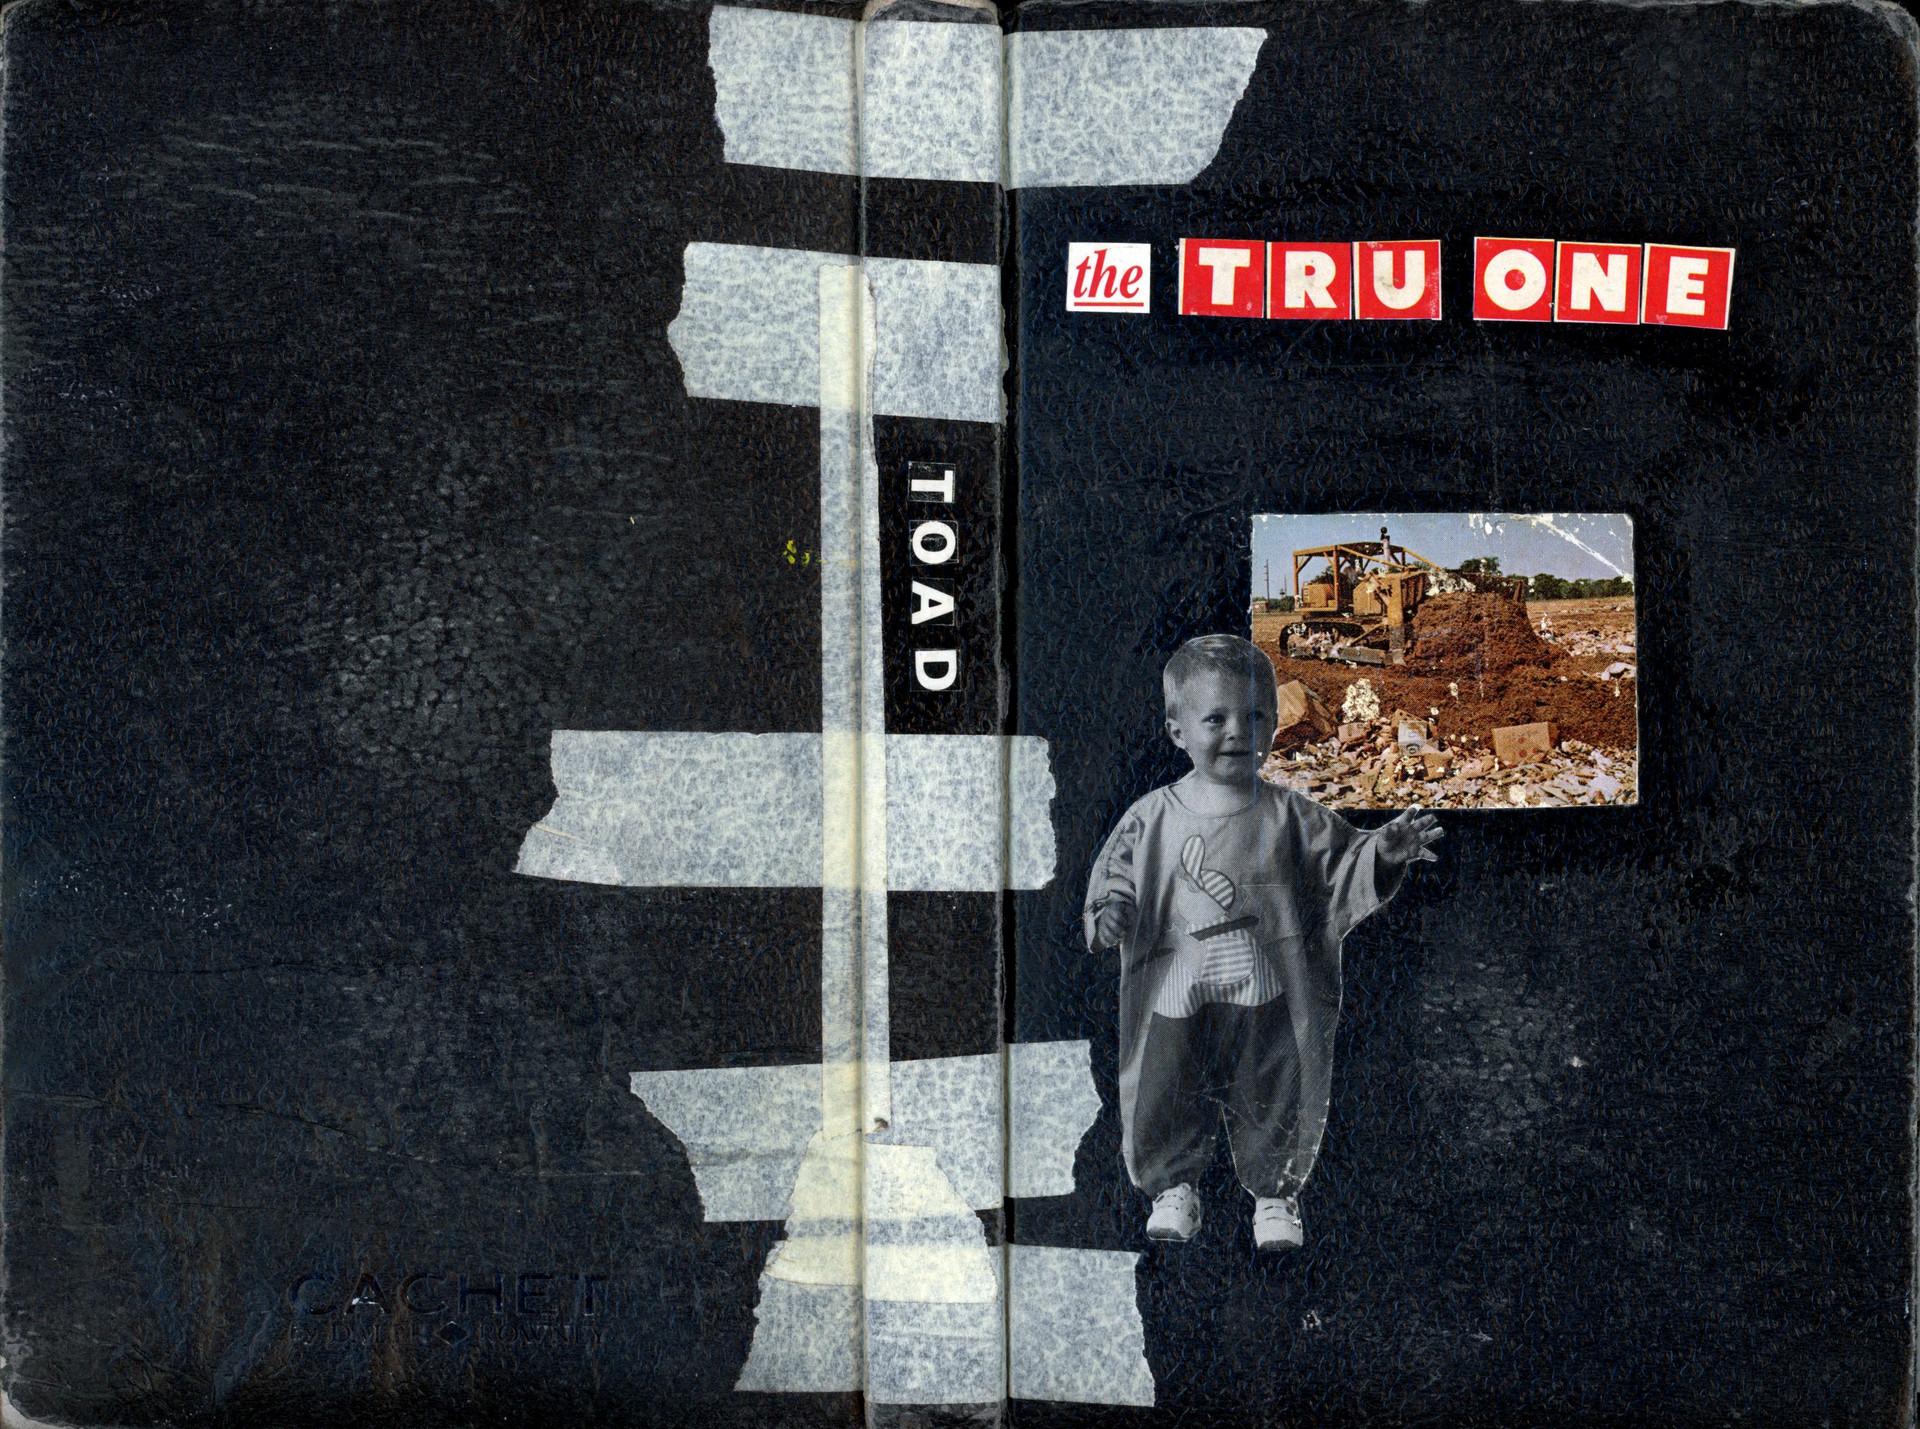 TRUONE_003.jpg